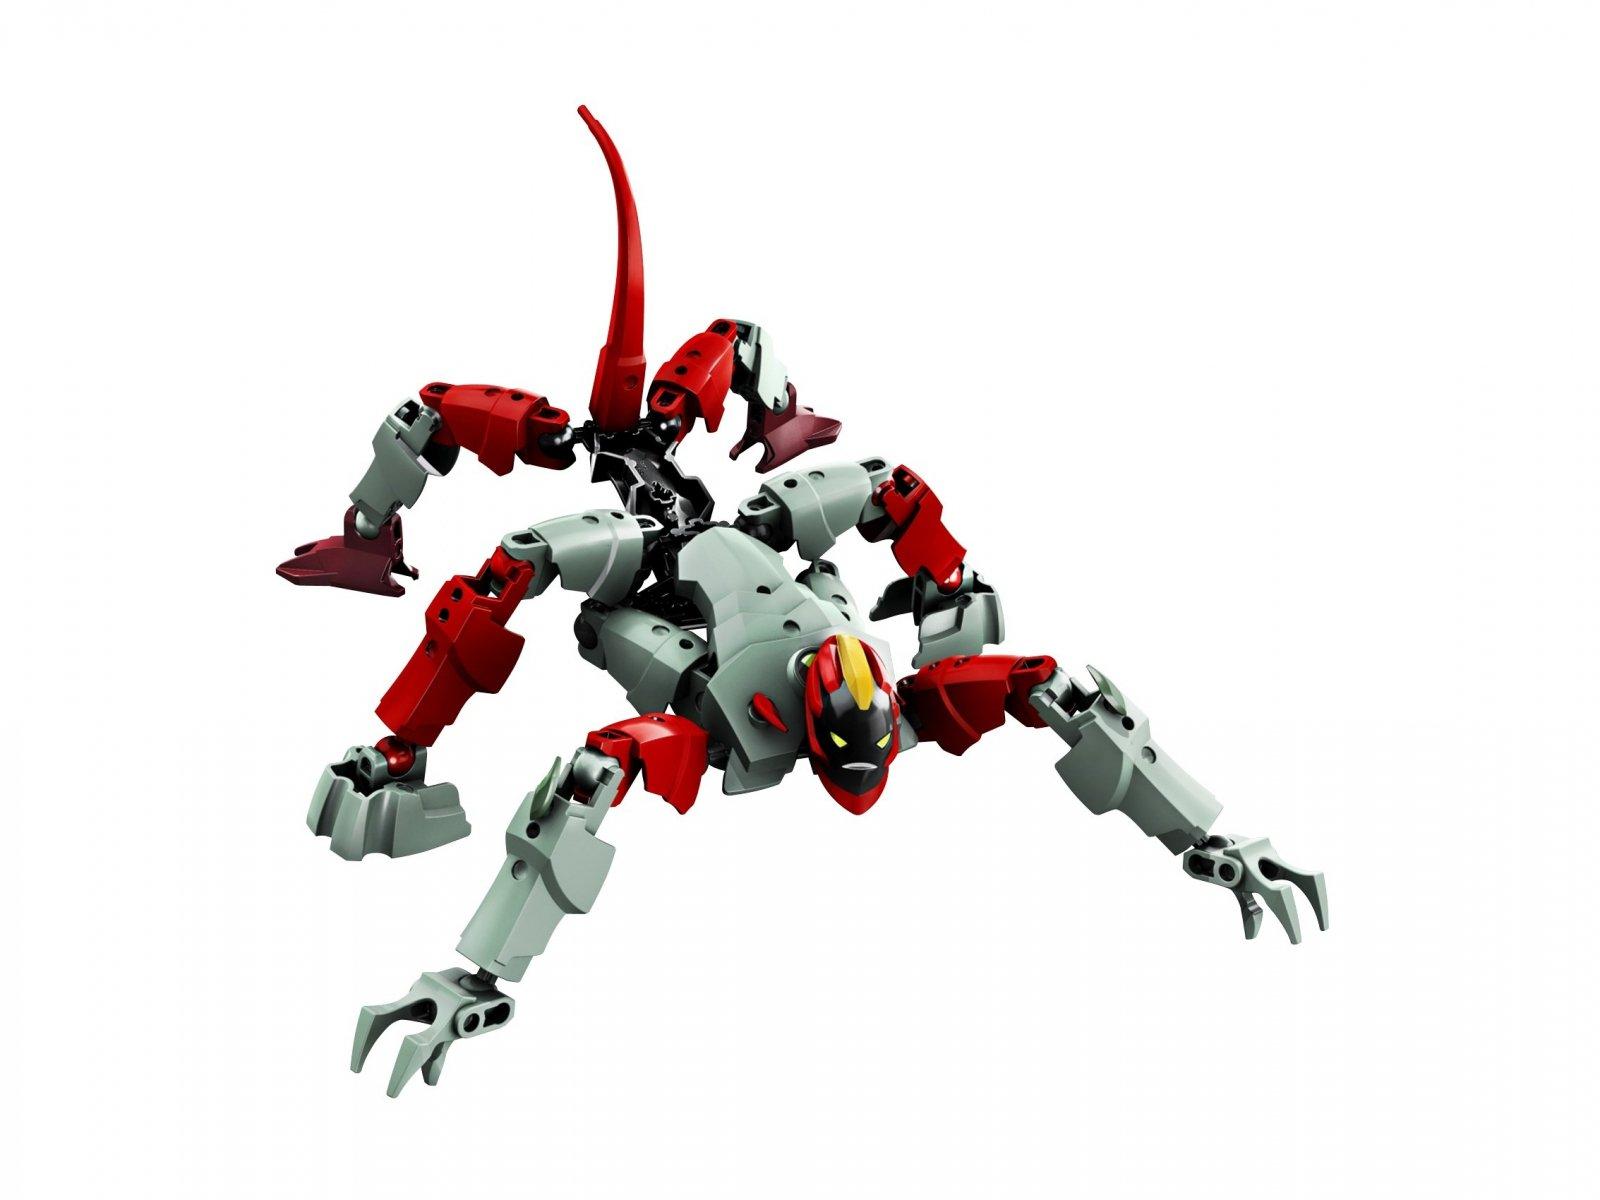 LEGO Ben 10 Alien Force™ Szlamfajer 8410